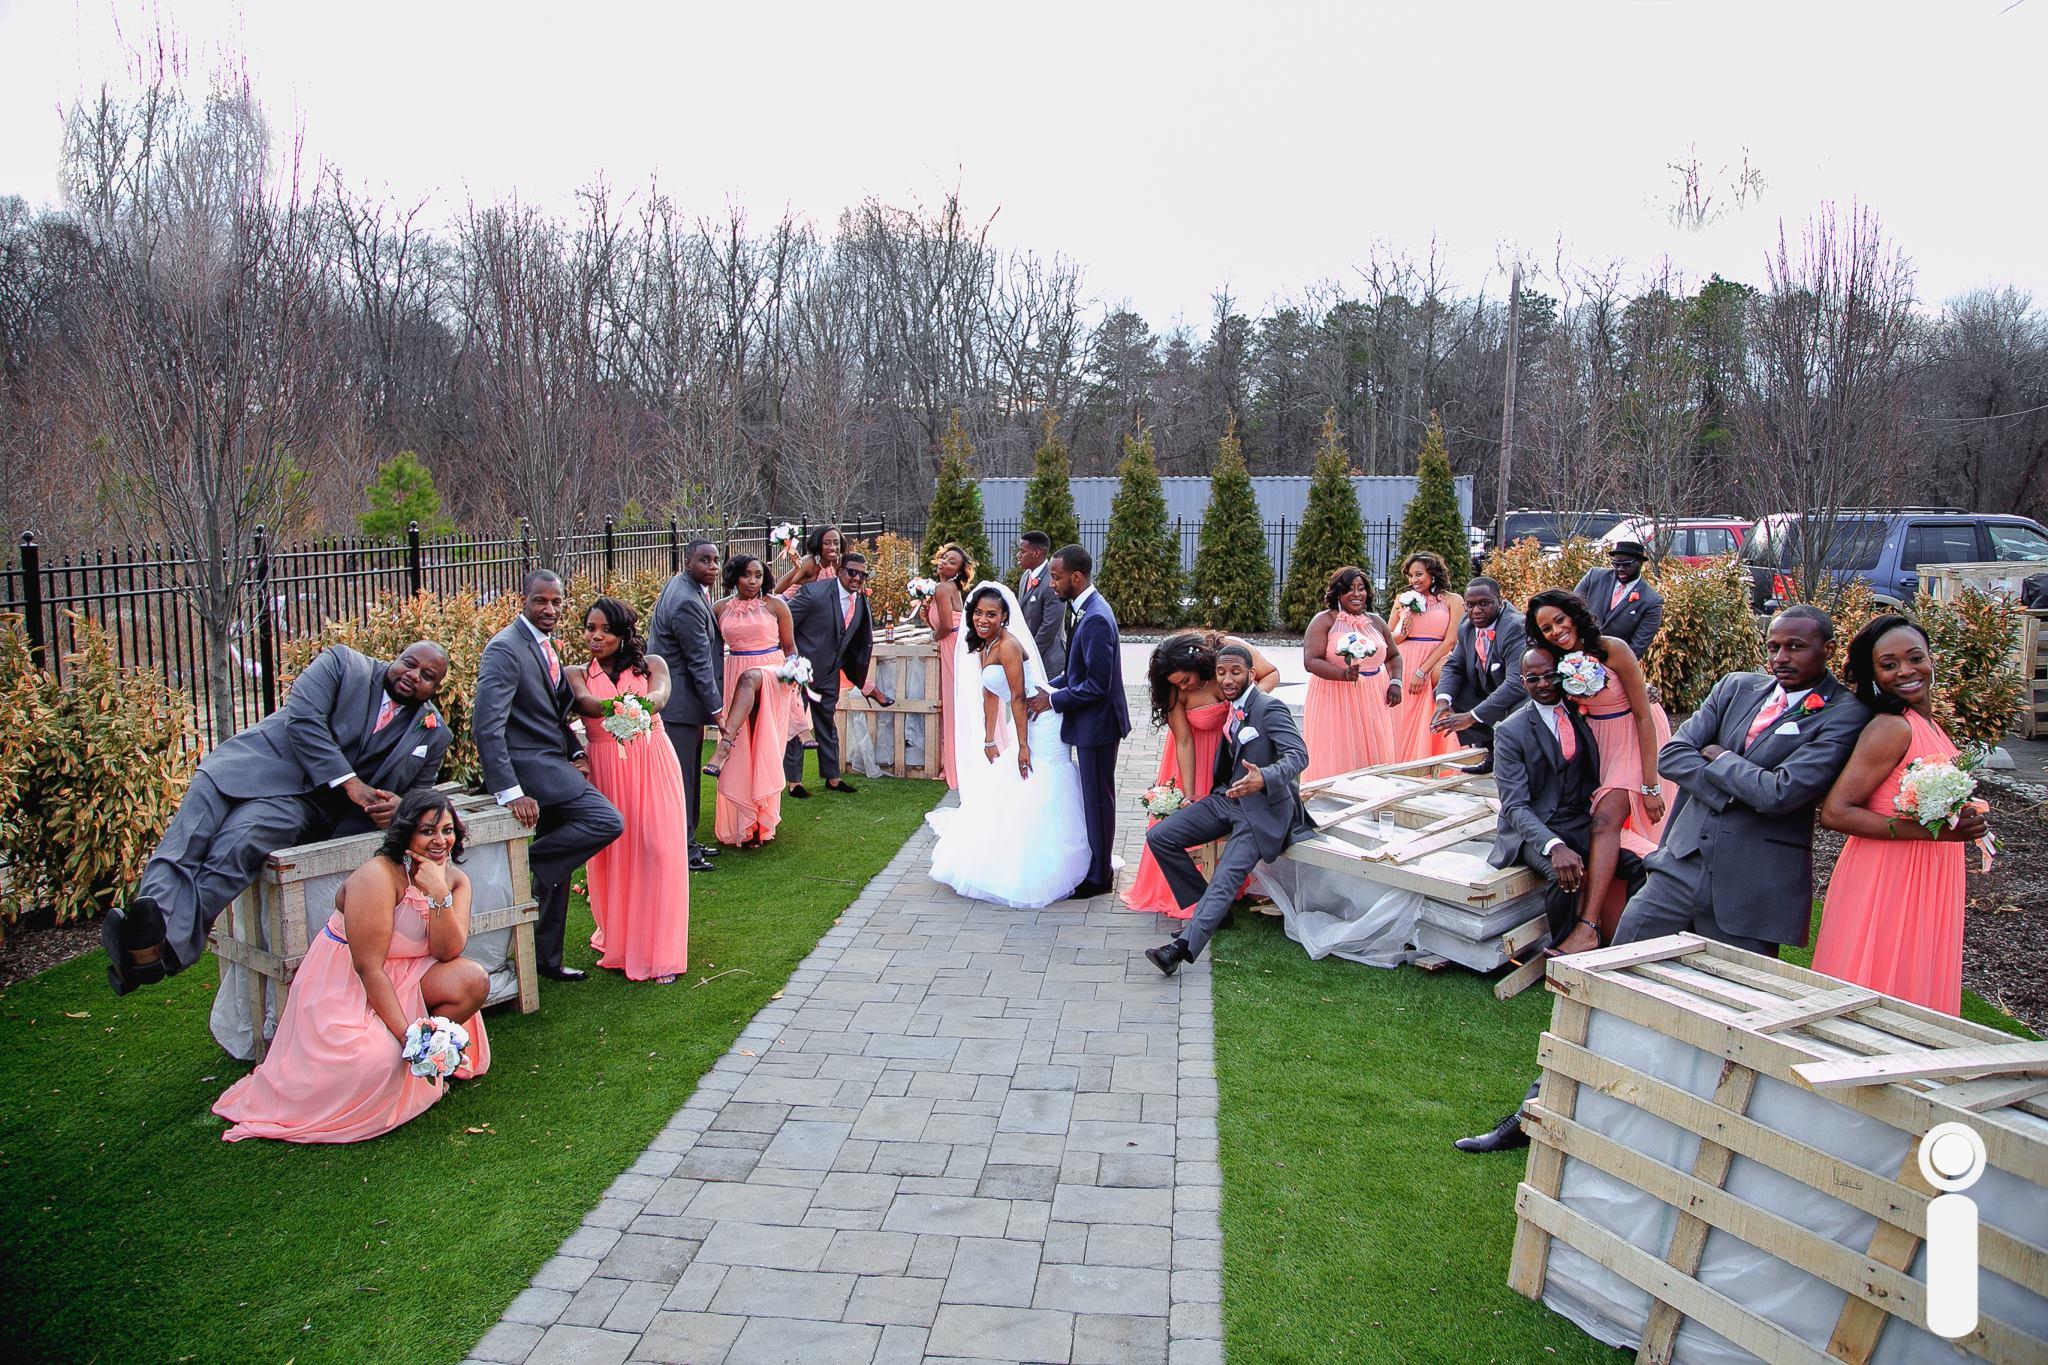 farrel wedding 4.jpg